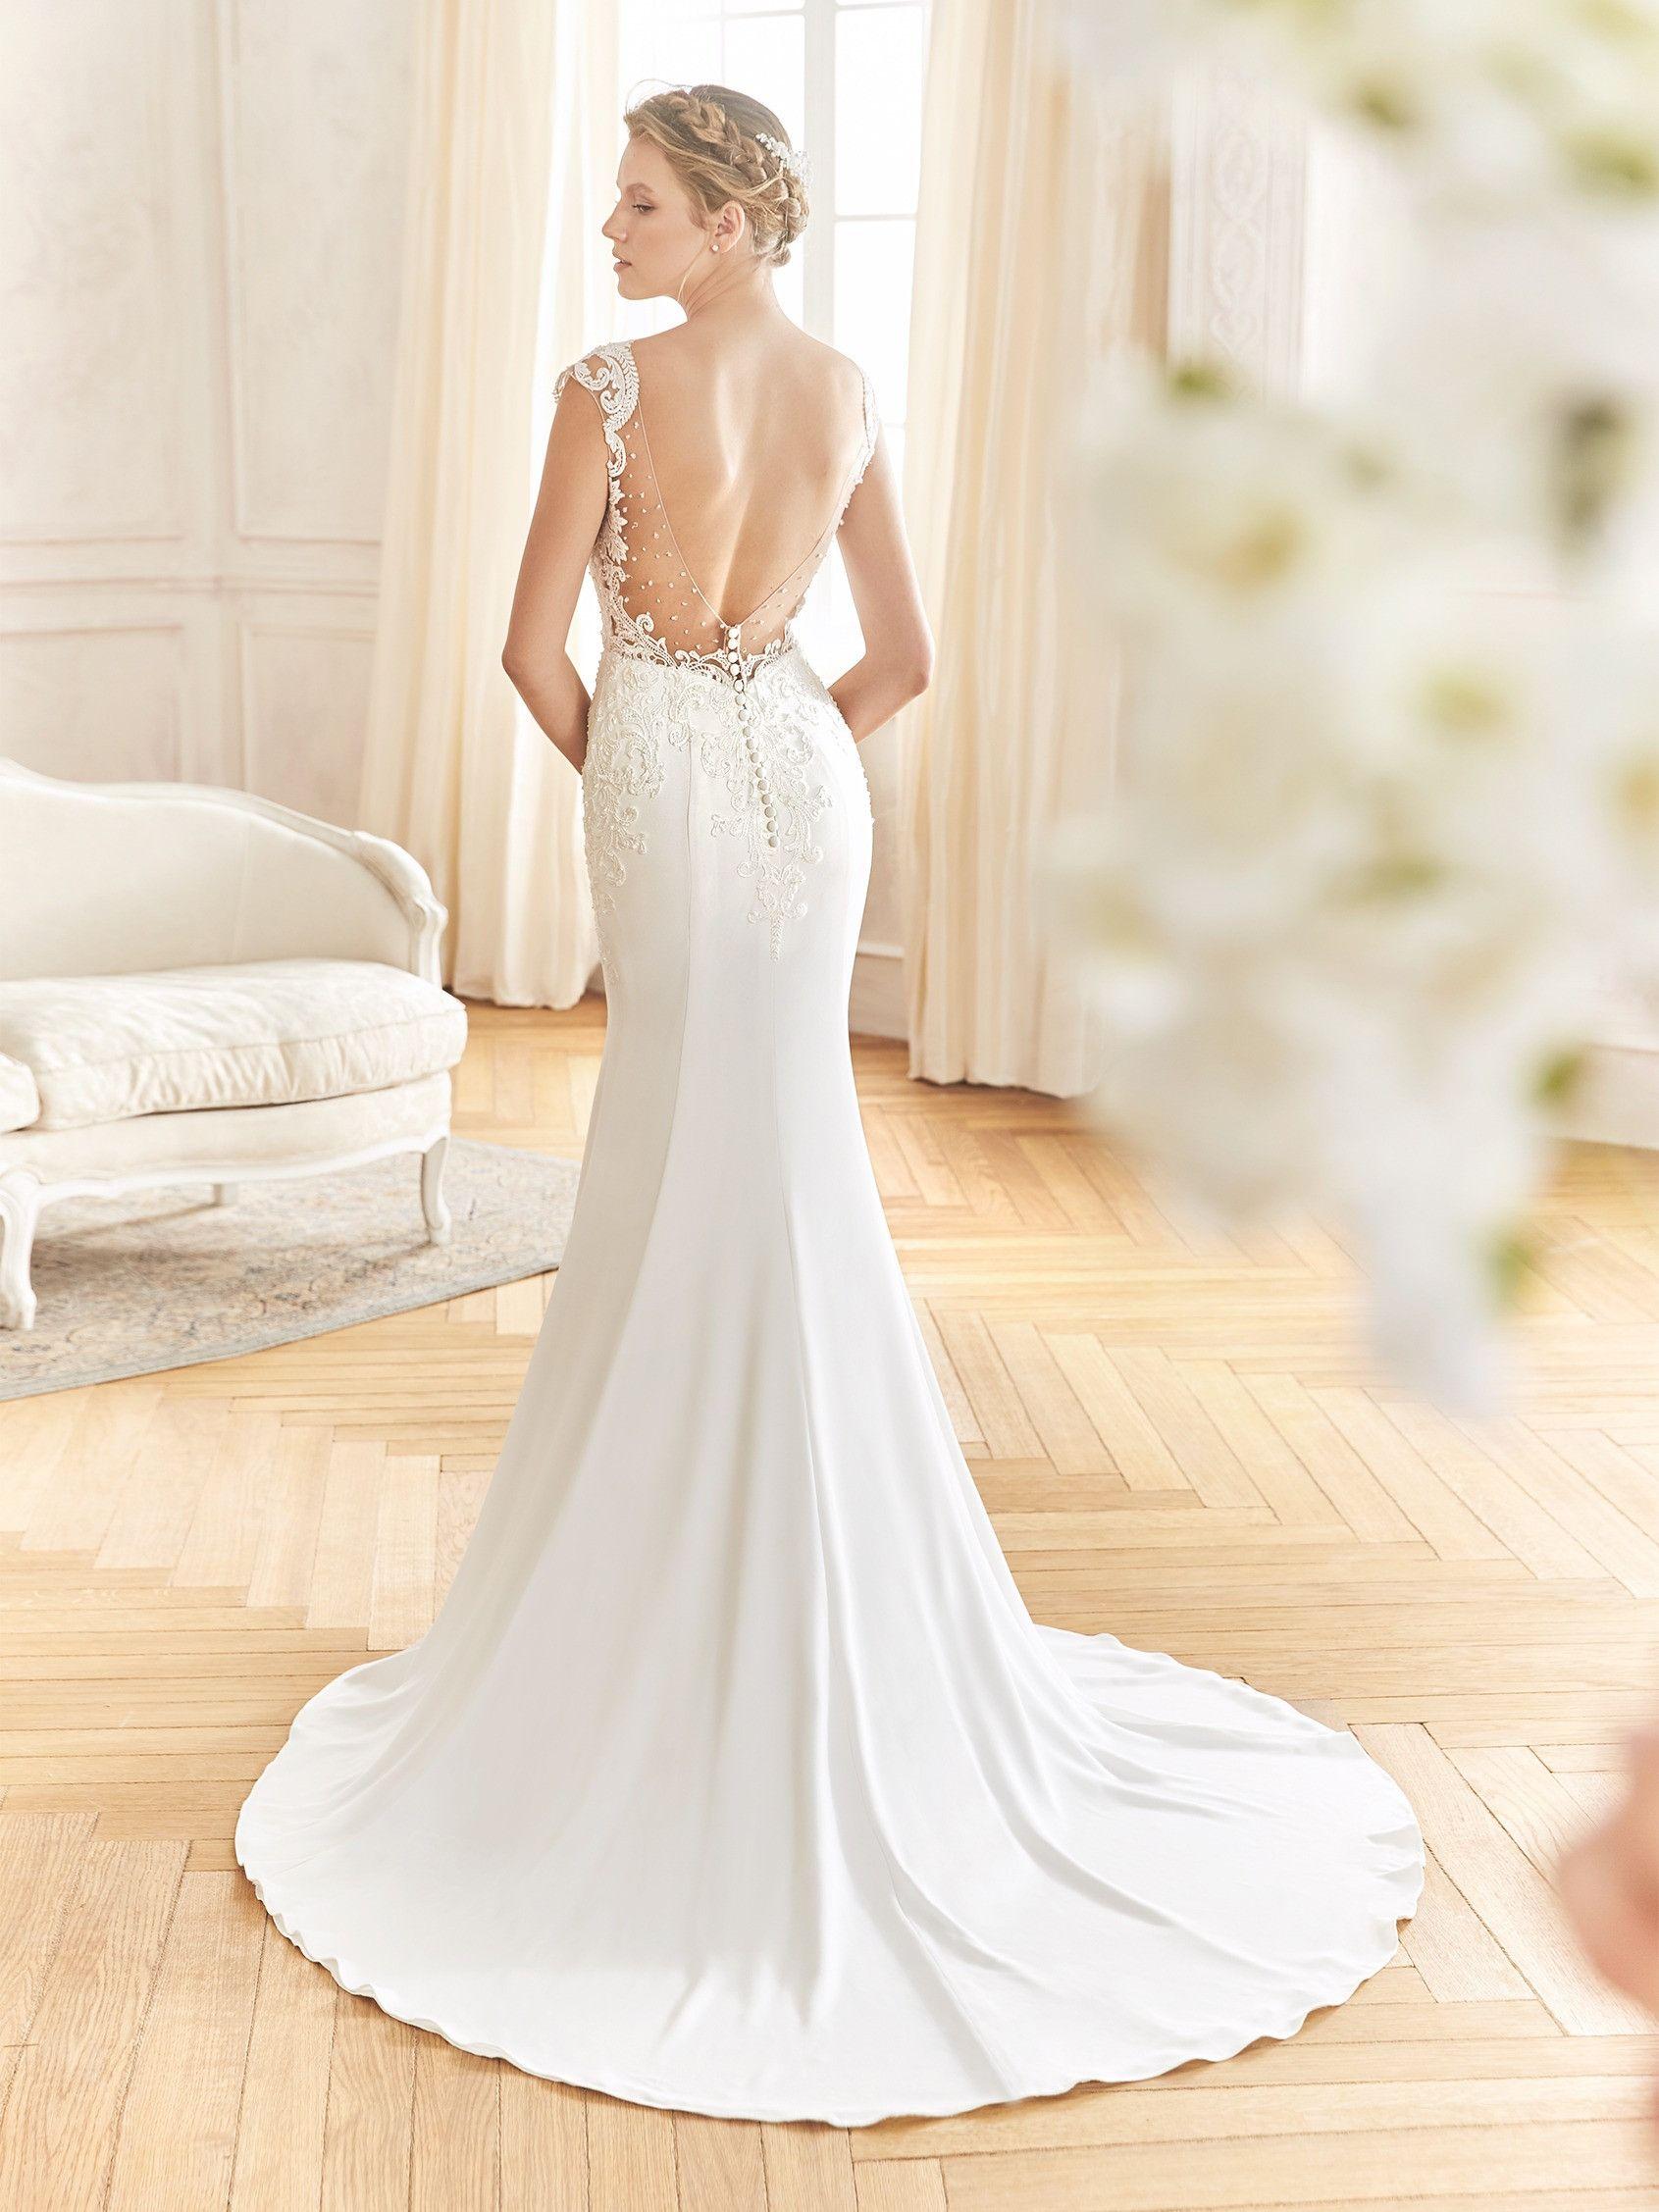 Trouwjurk La Sposa Balanza Een sexy en elegante trouwjurk van het merk La  Sposa. De 36103a640b7a